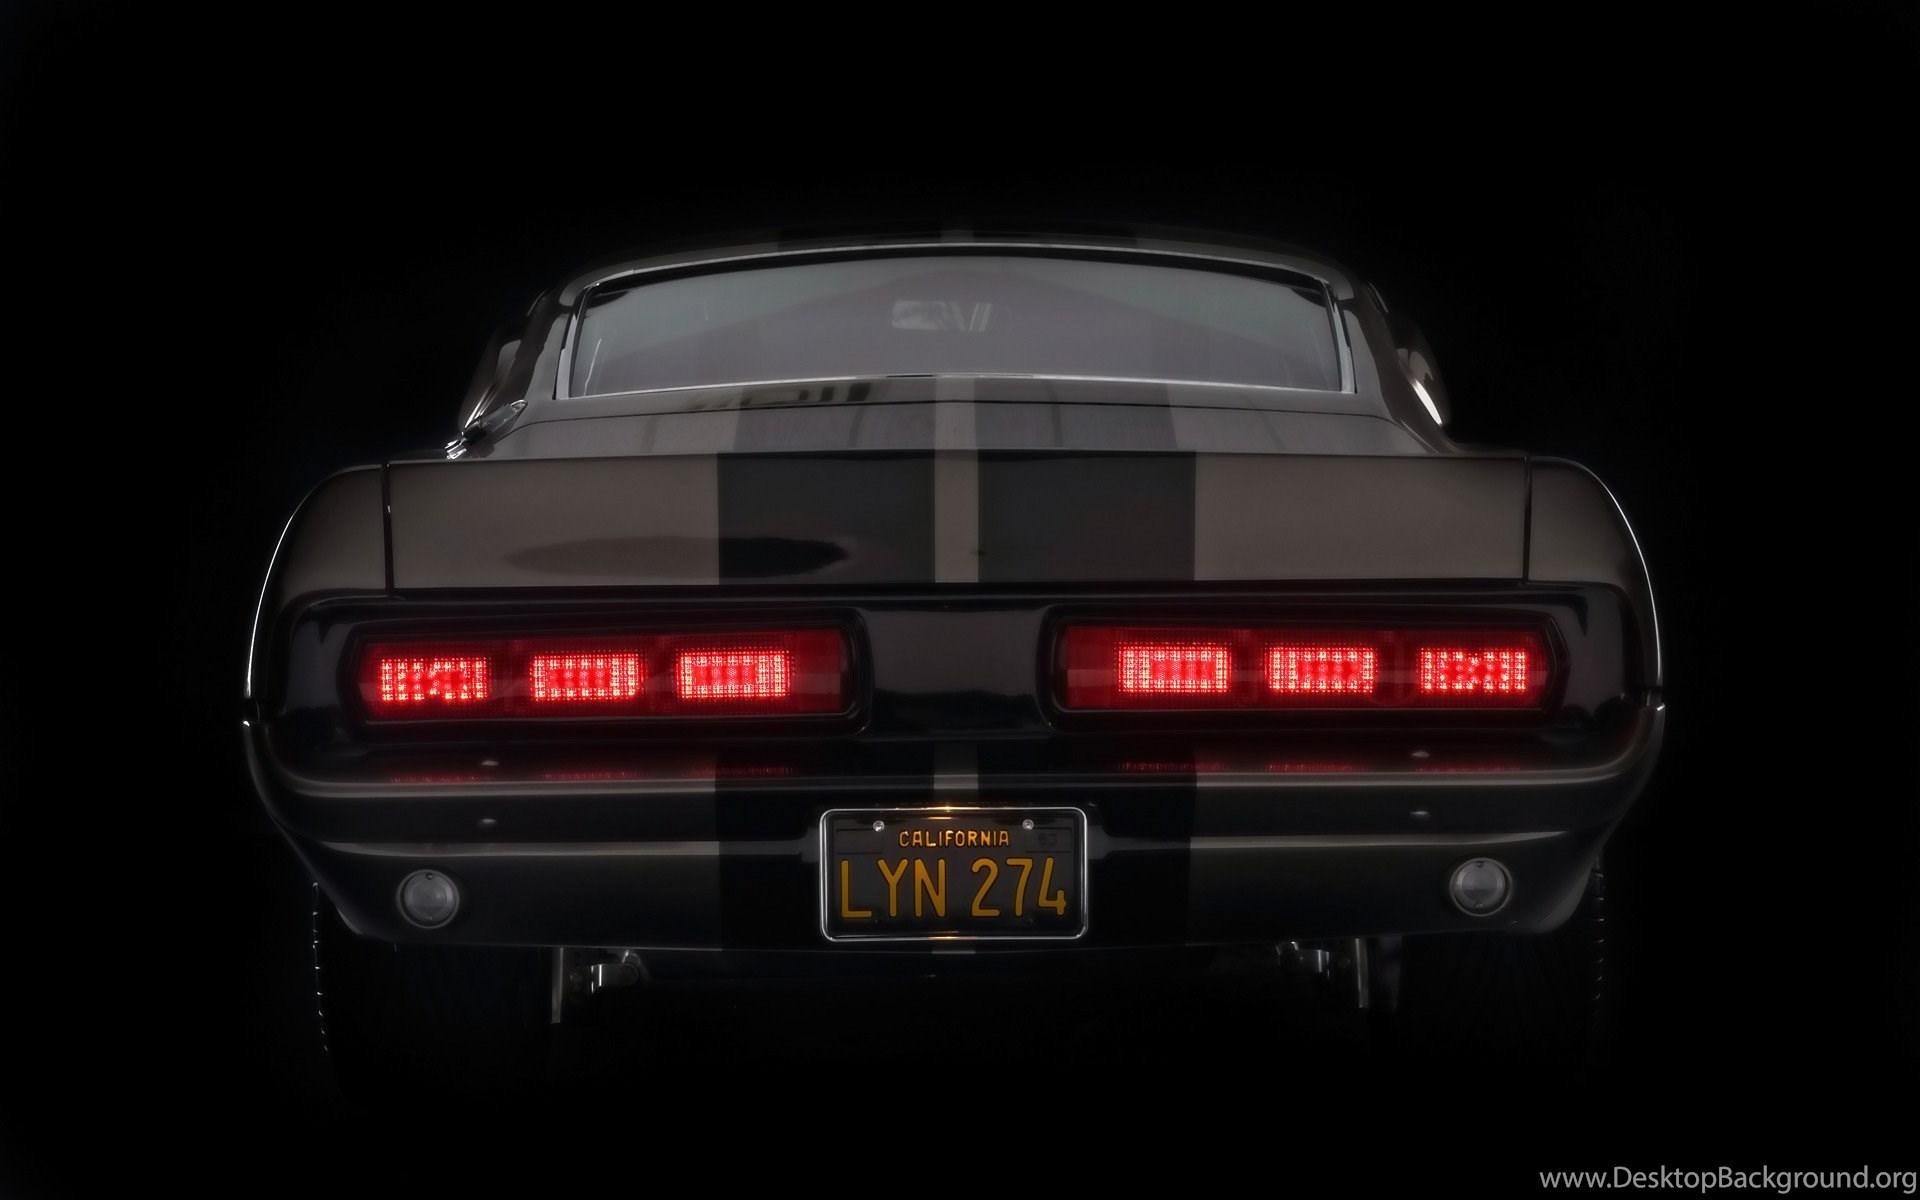 1967 Mustang Fastback Gone In 60 Seconds Eleanor Rear Lights